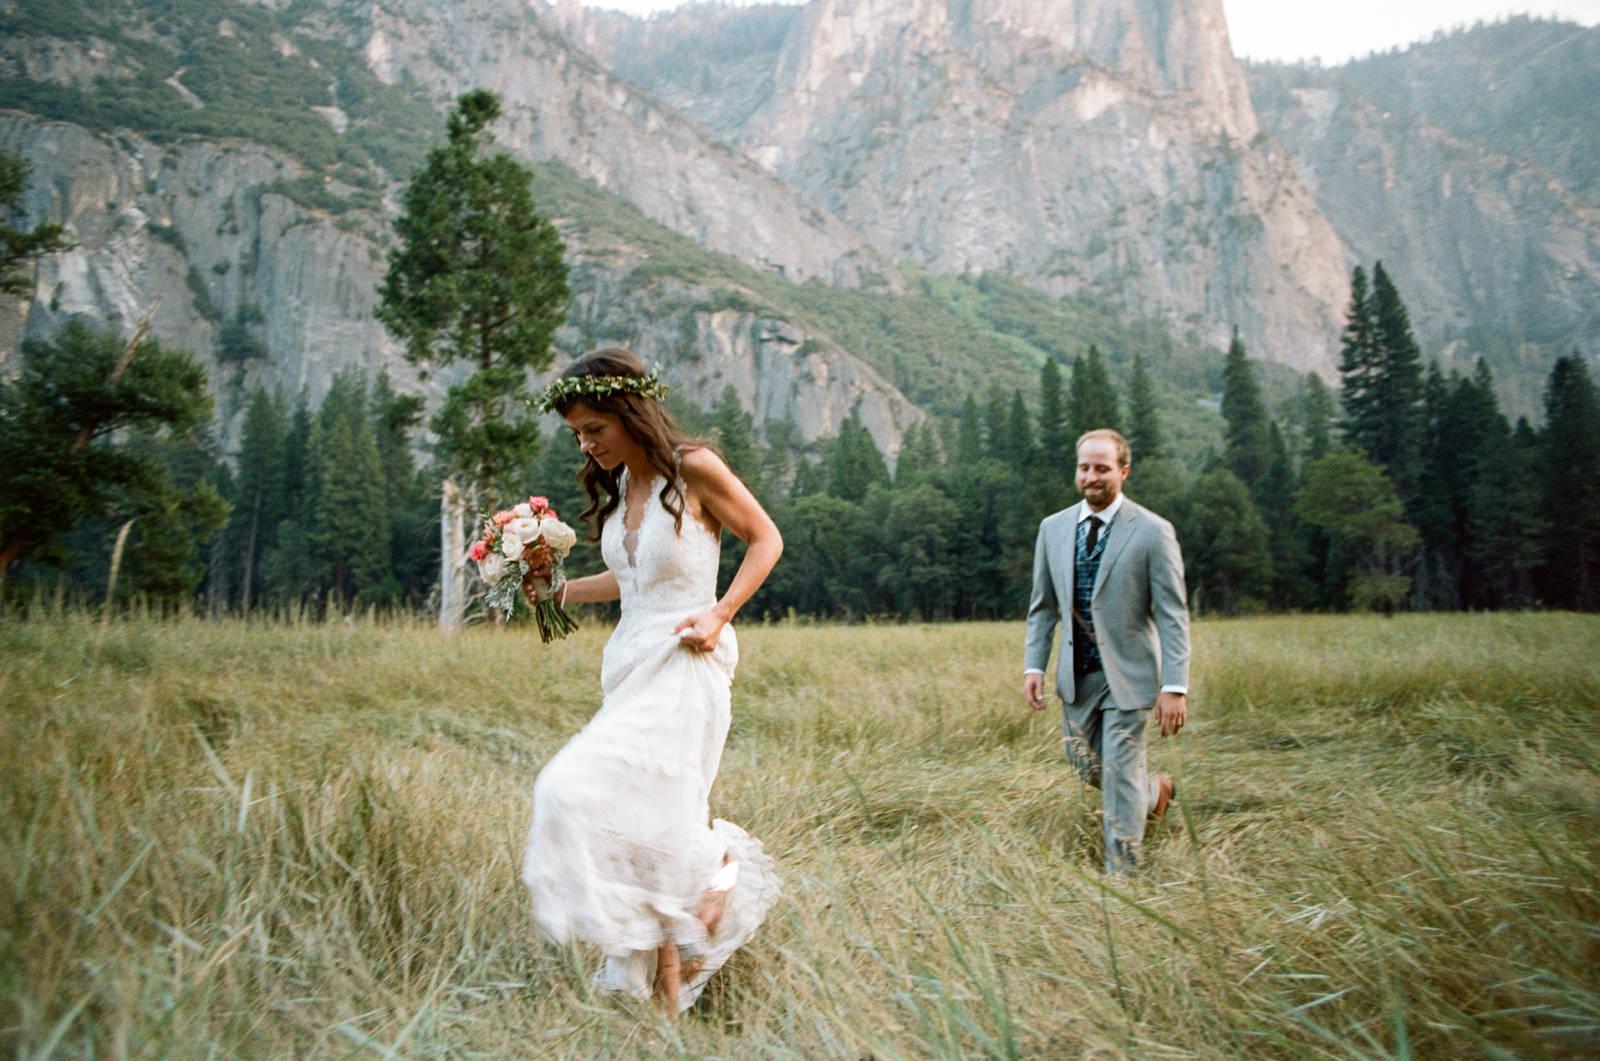 yosemite-intimate-wedding-092 YOSEMITE INTIMATE WEDDING